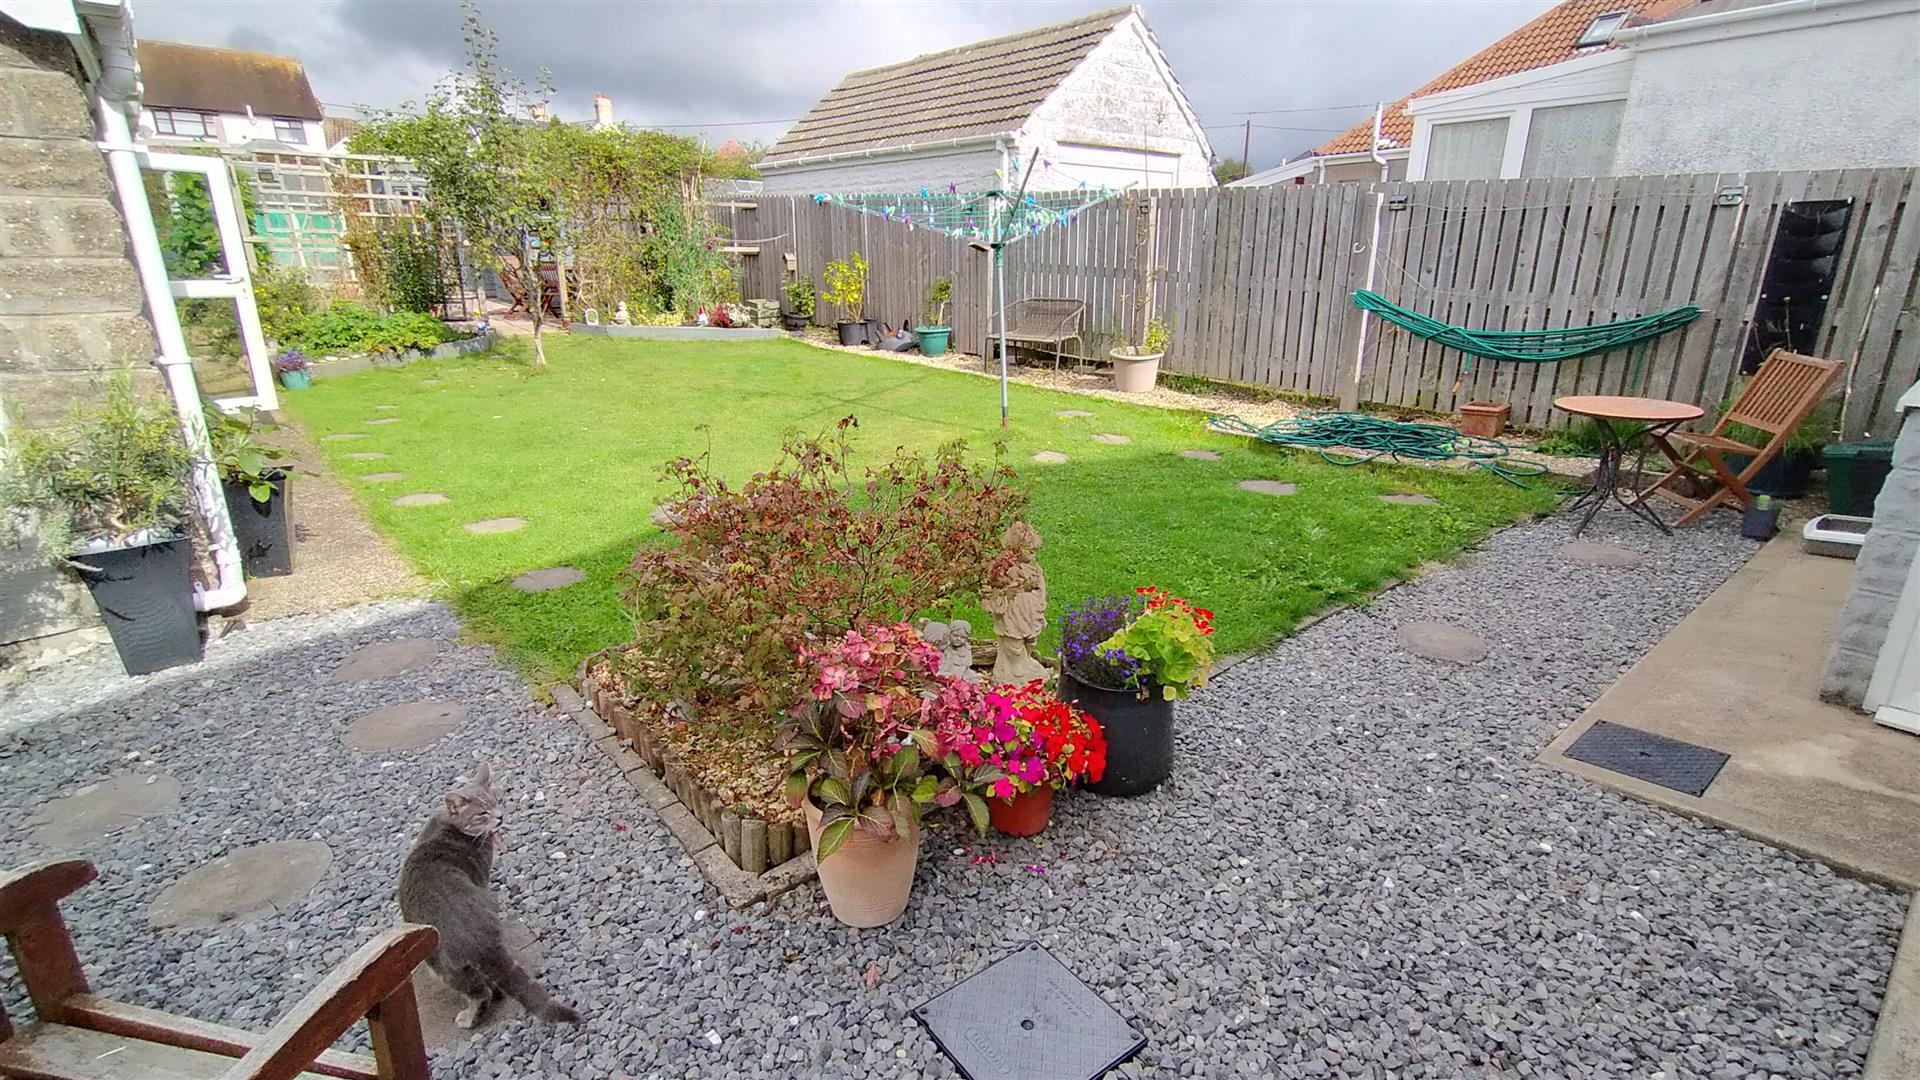 Belvedere Close, Kittle, Swansea, SA3 3LA